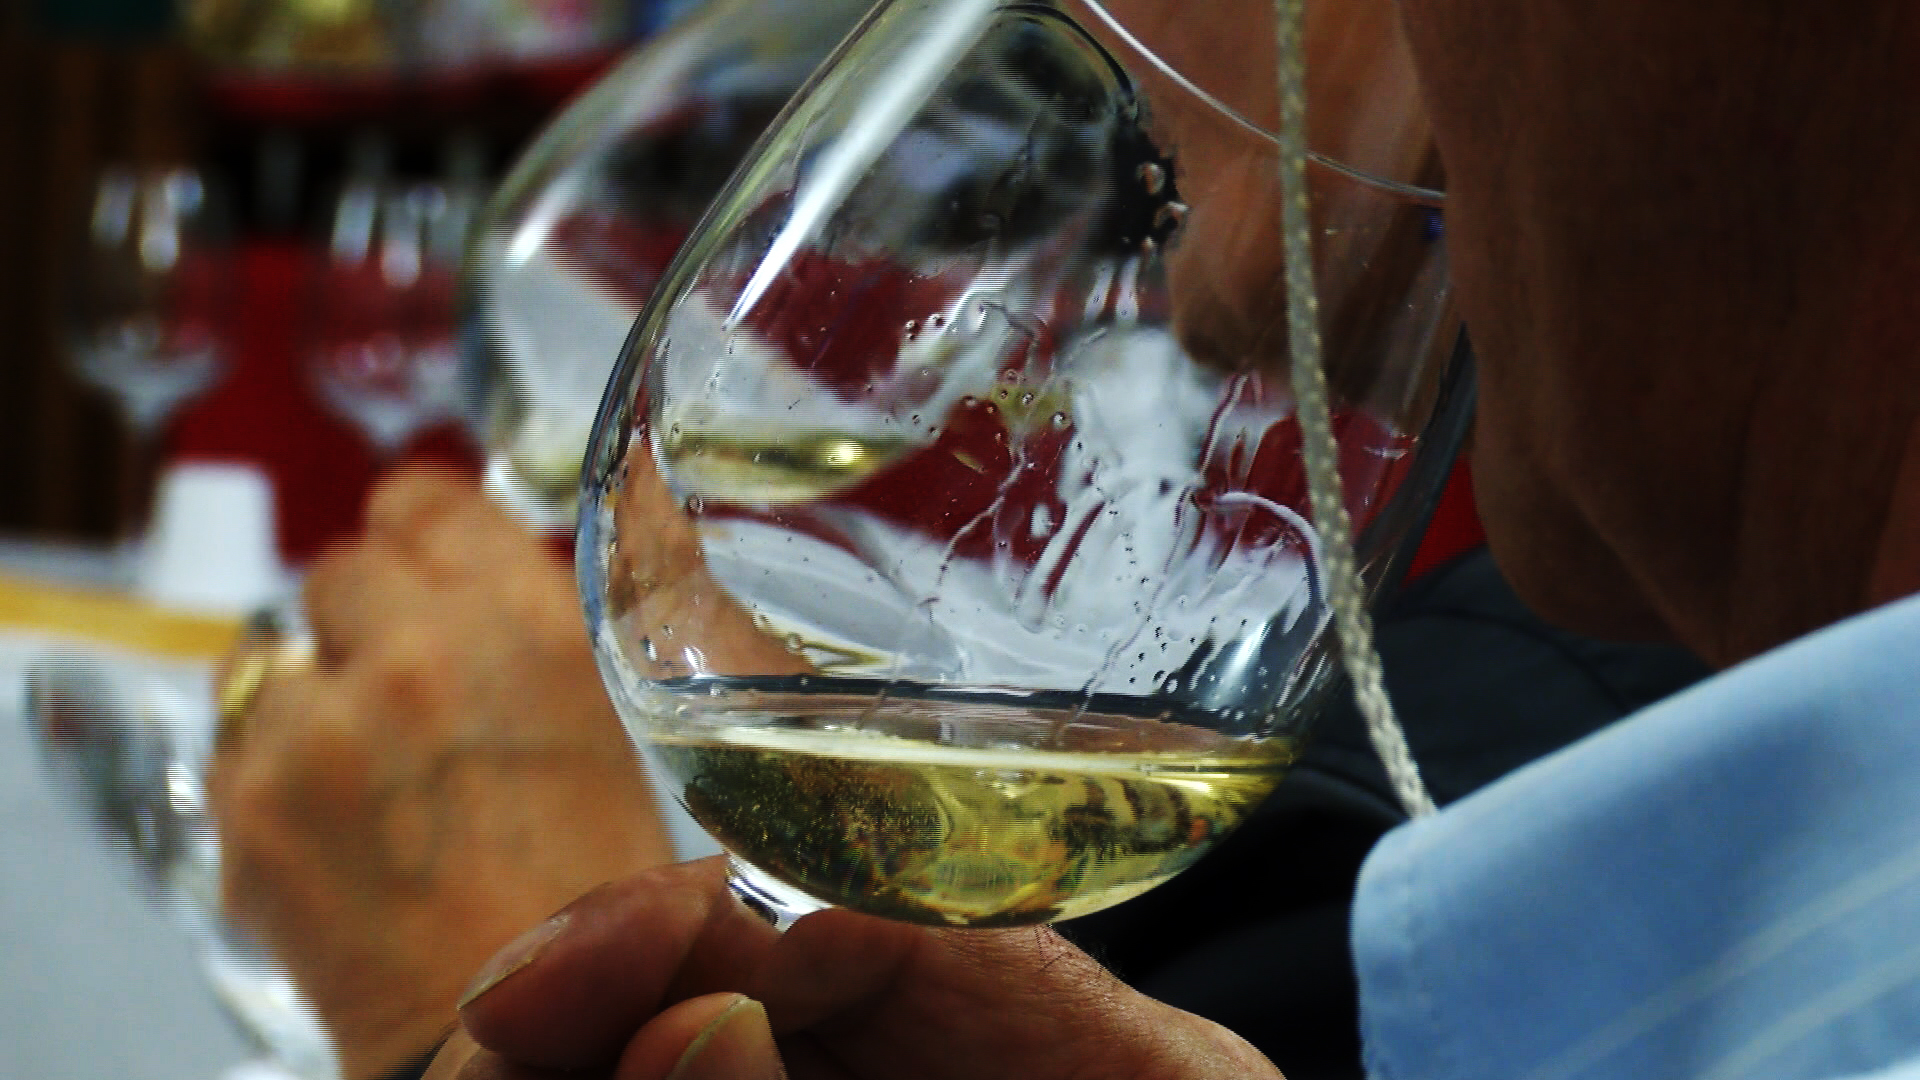 vino bianco del piemonte nas-cetta